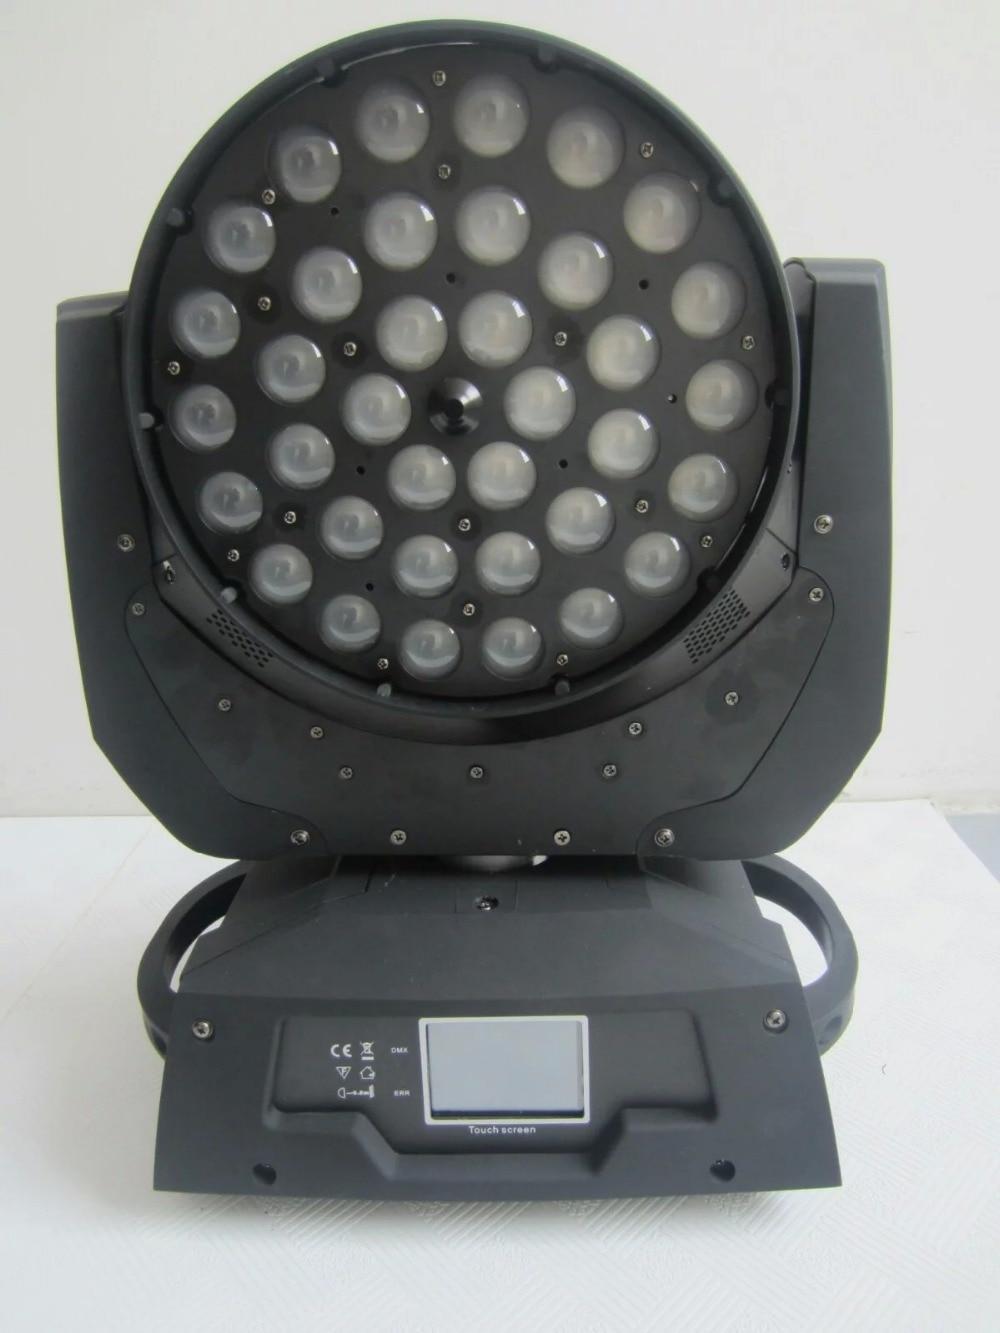 Guangzhou podium licht fabriek LCD touchscreen 36 stks * 18 W RGBWA UV LED zoom moving head dj lichten